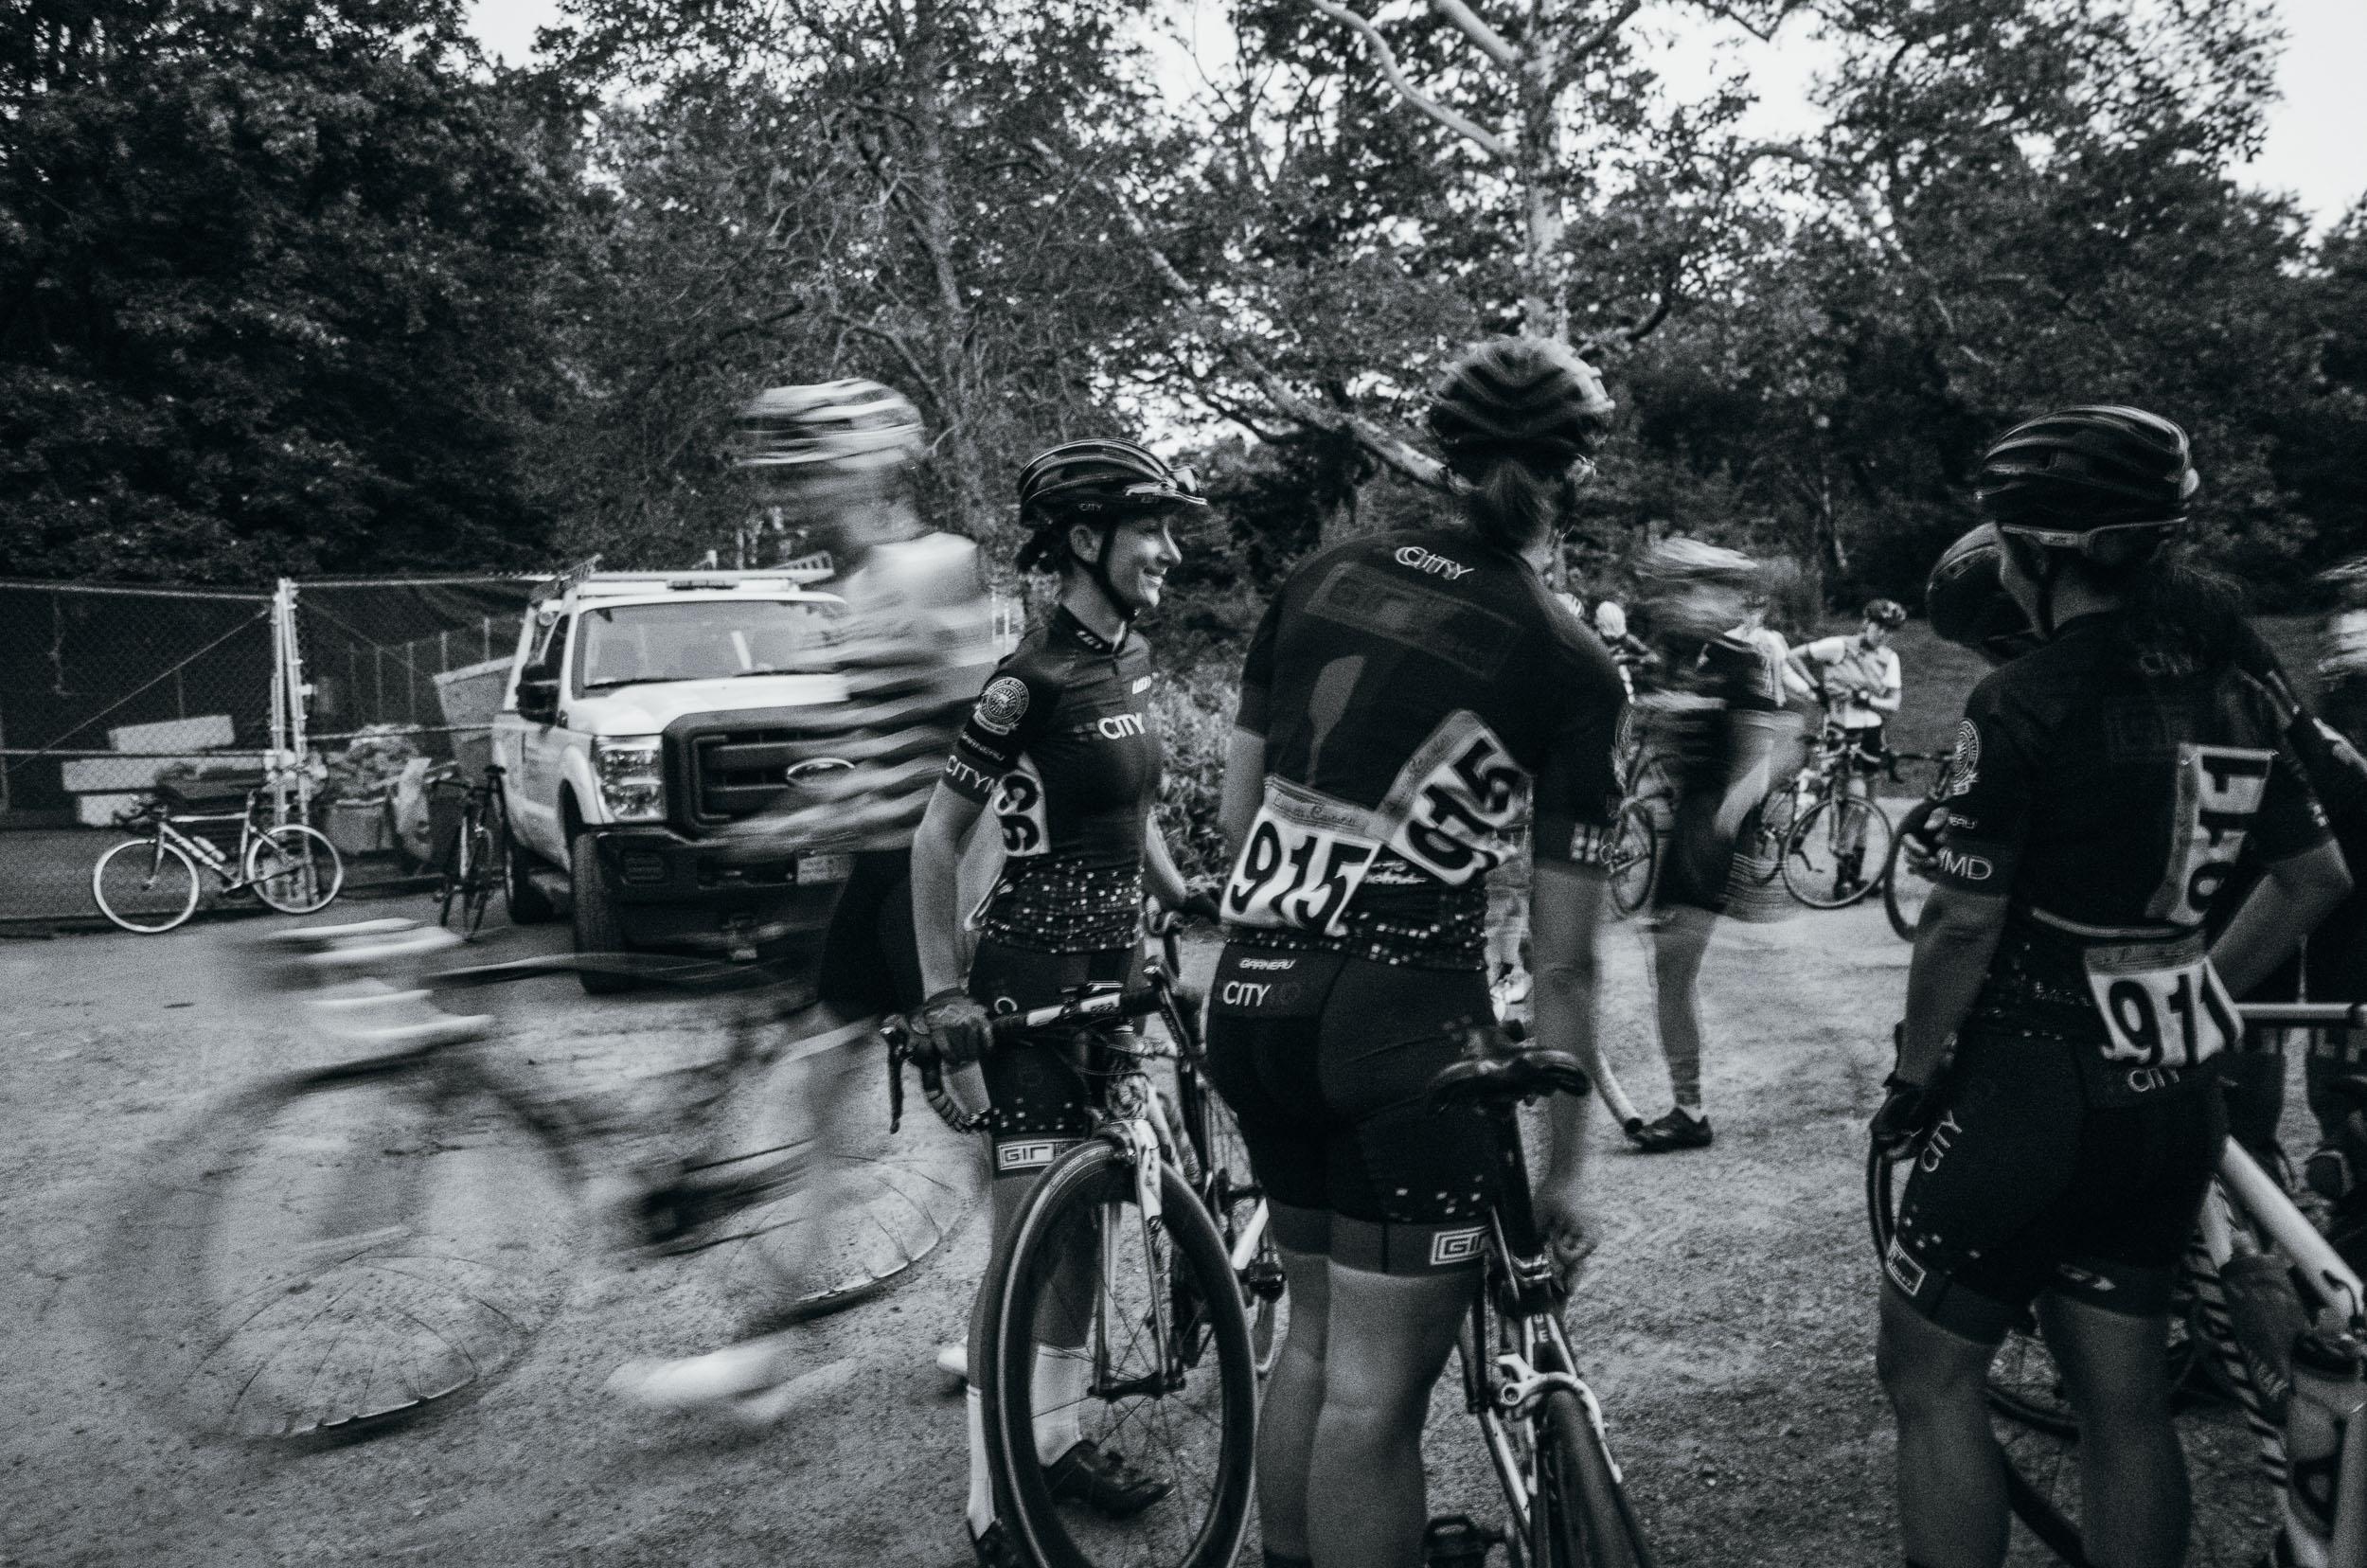 photo-rhetoric-to-be-determined-crca-club-race-111.jpg